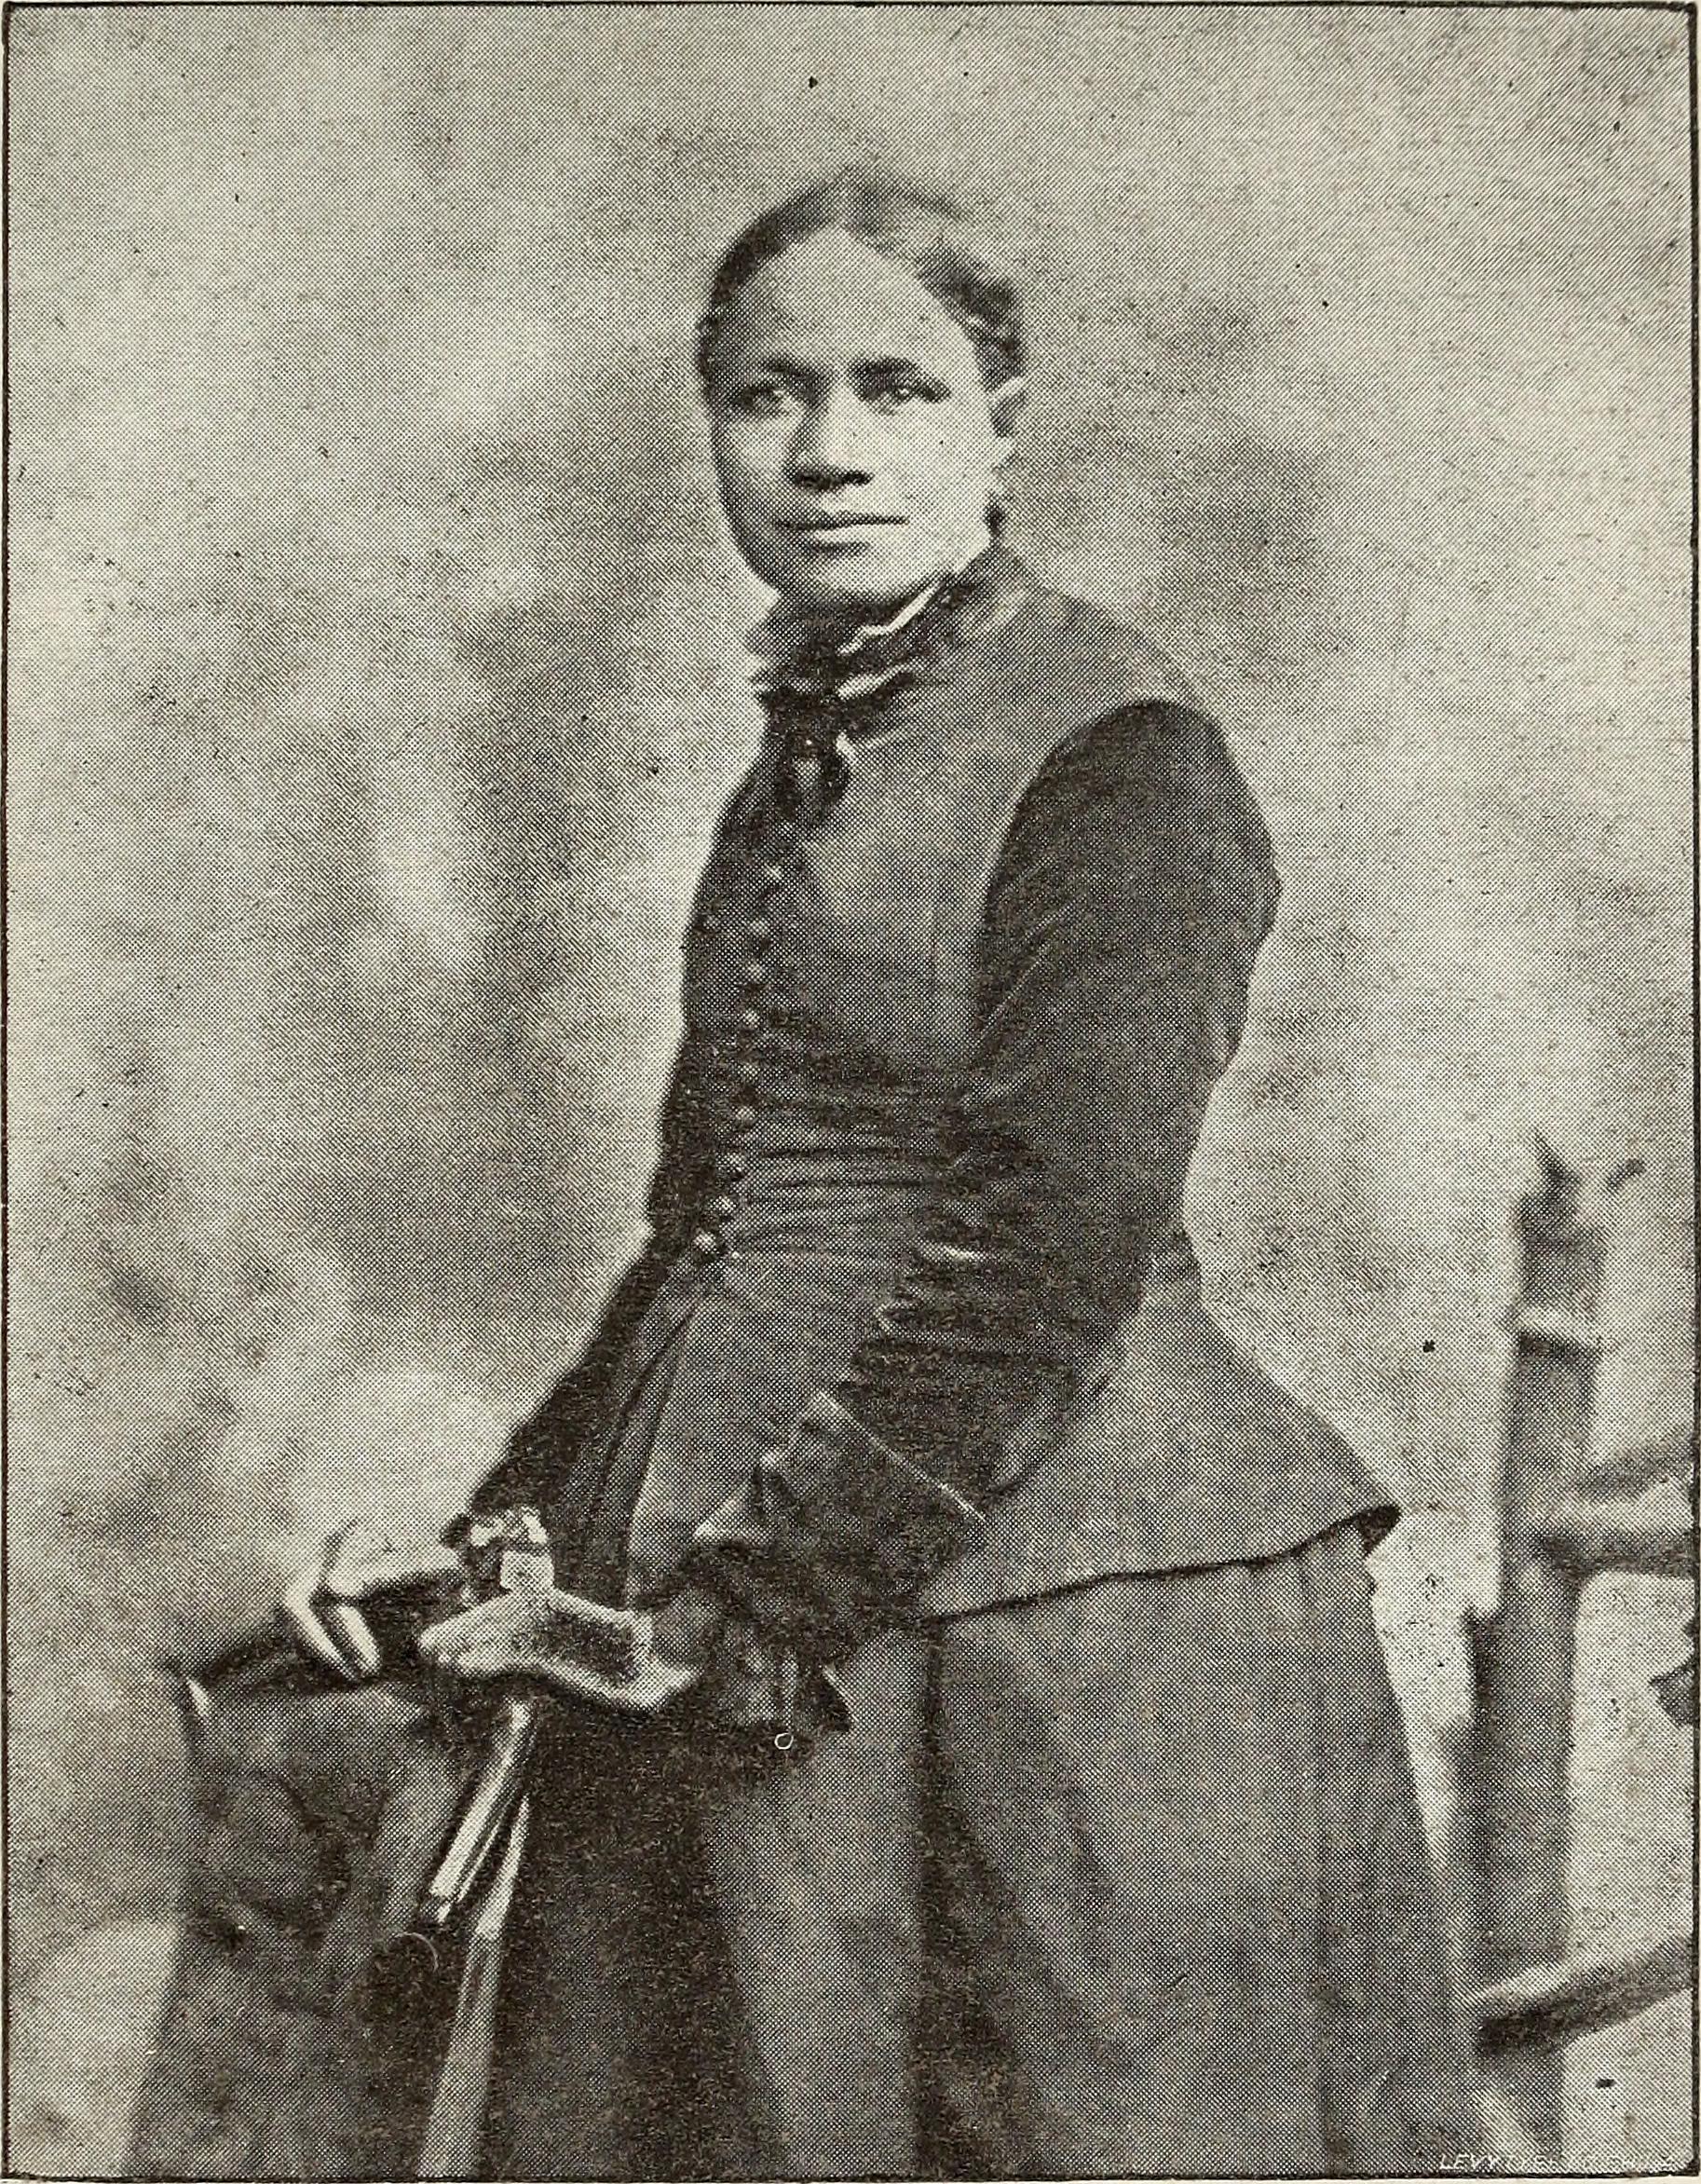 Maya Tai Dorsey